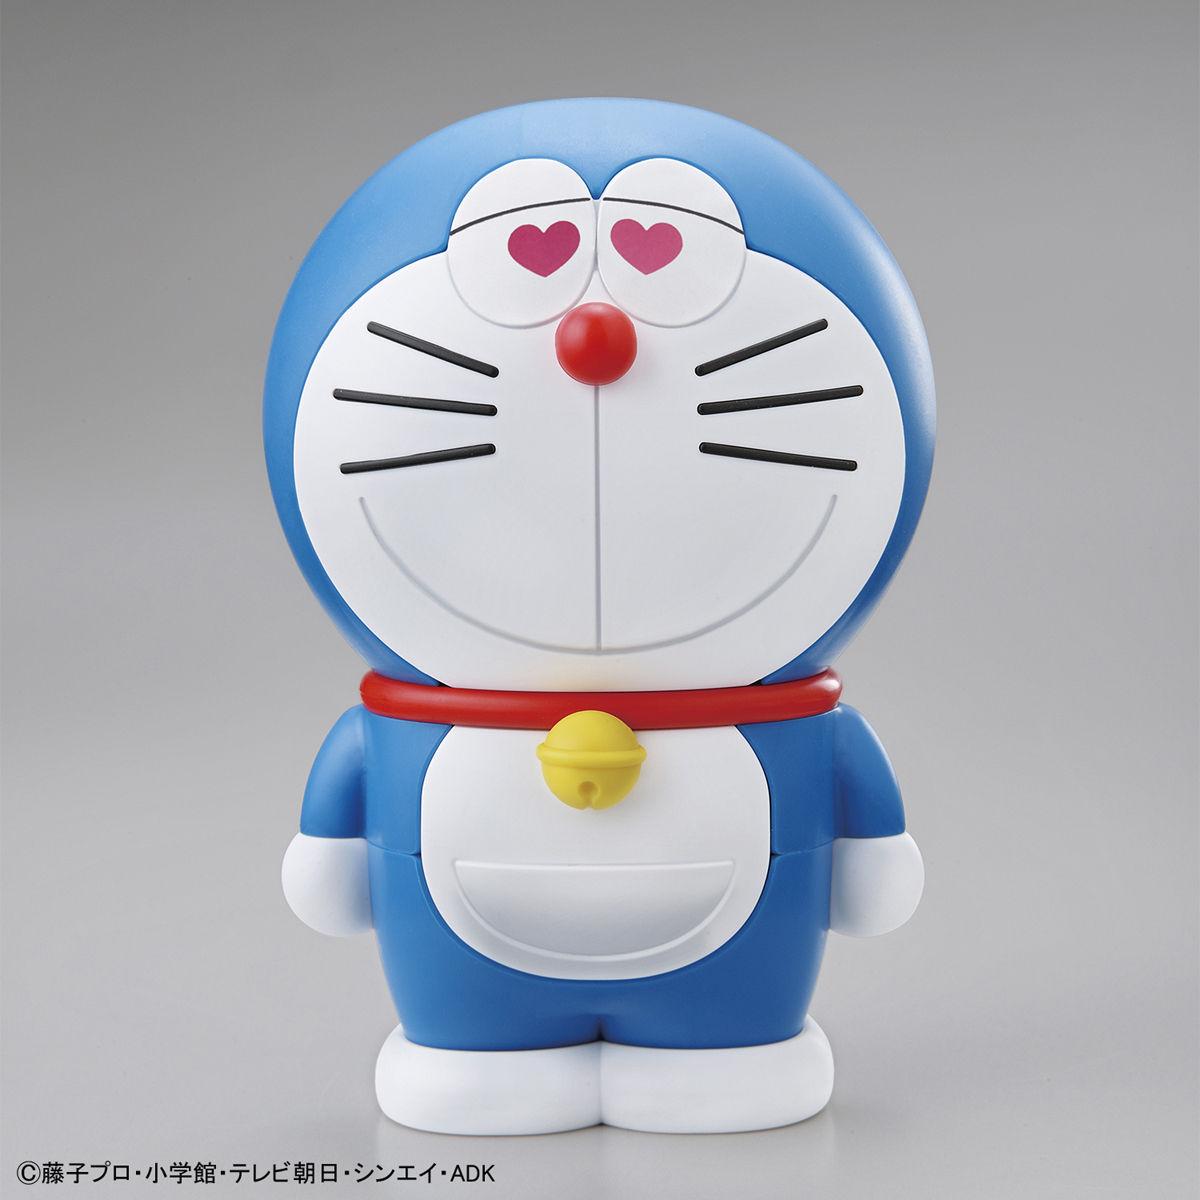 GUNDAM.MY: Bandai Entry Grade Doraemon landed!